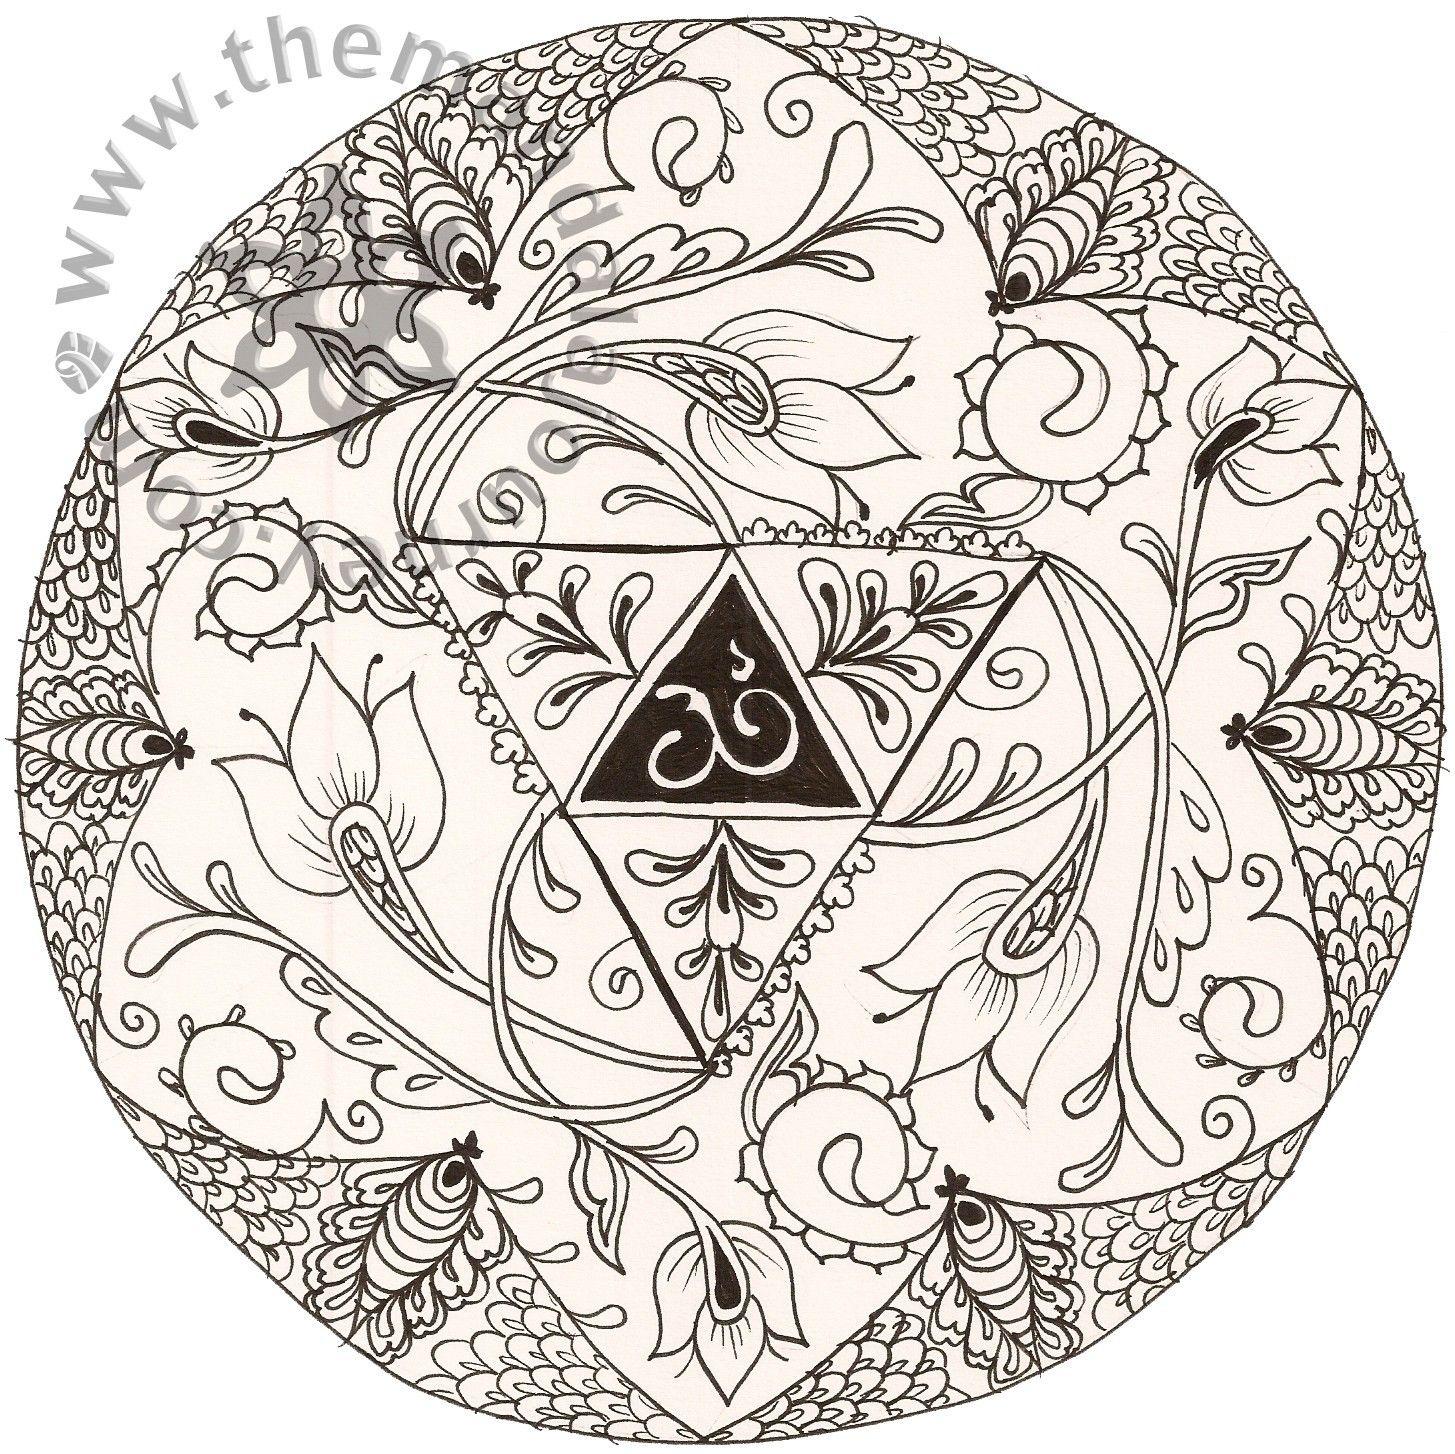 - Tibetan Buddhist Mandala Coloring Pages With Inspirationa Chakra